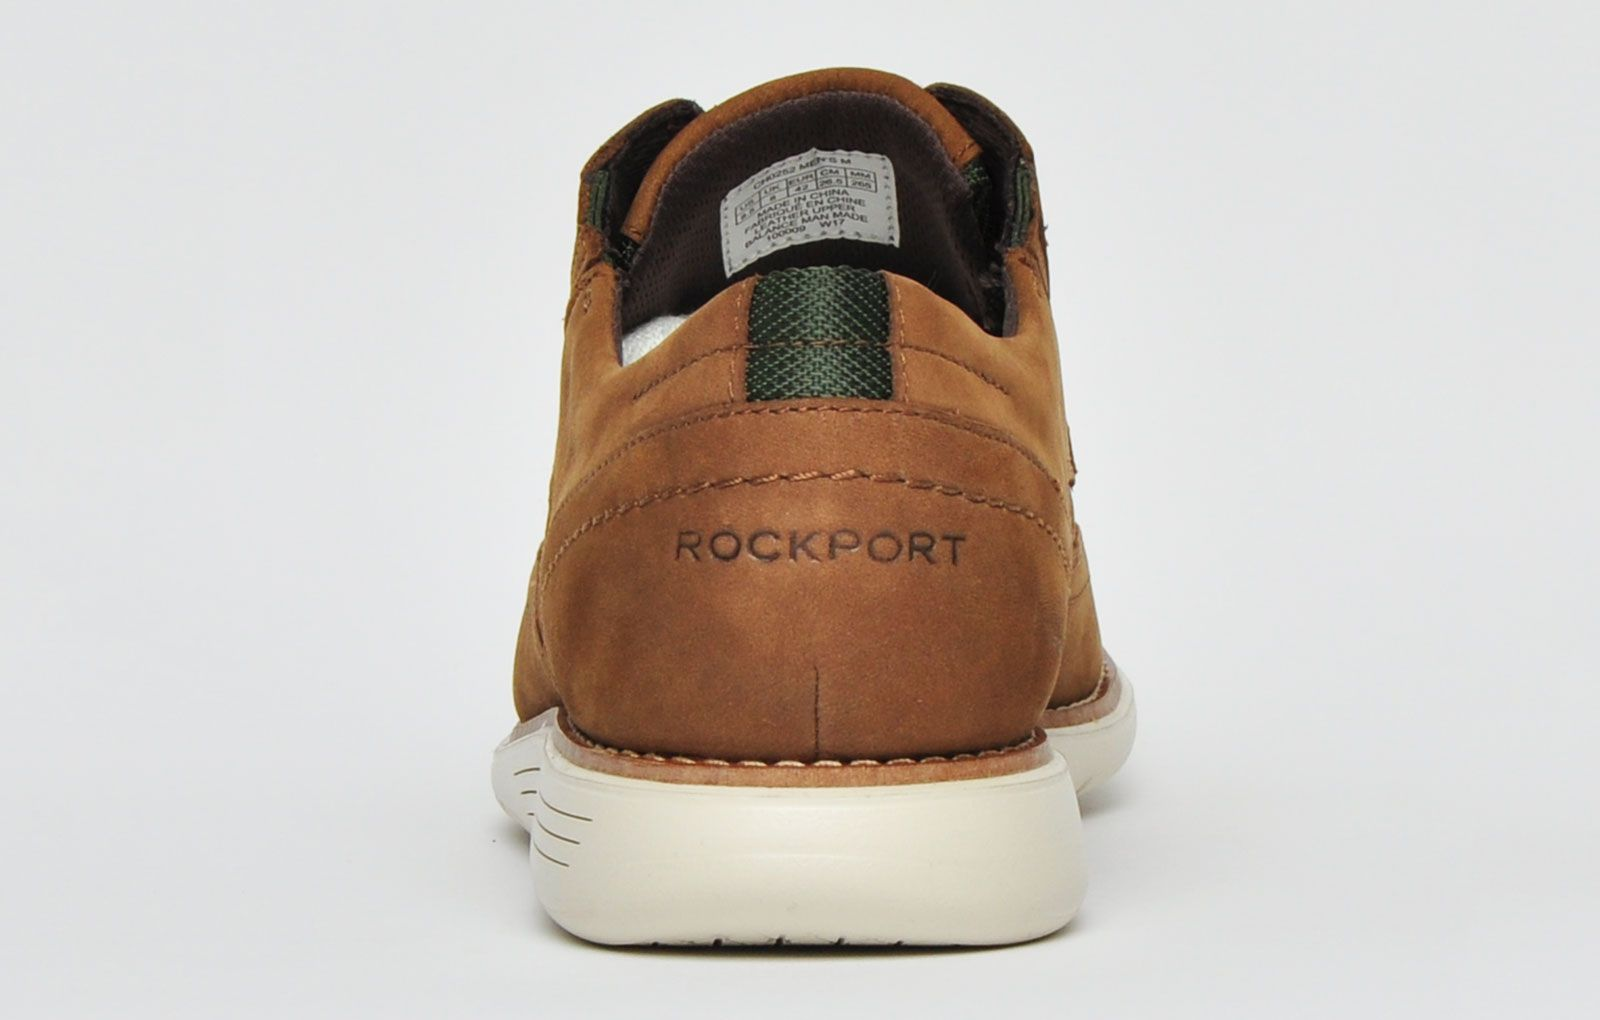 Rockport Total Motion Brogue Mens